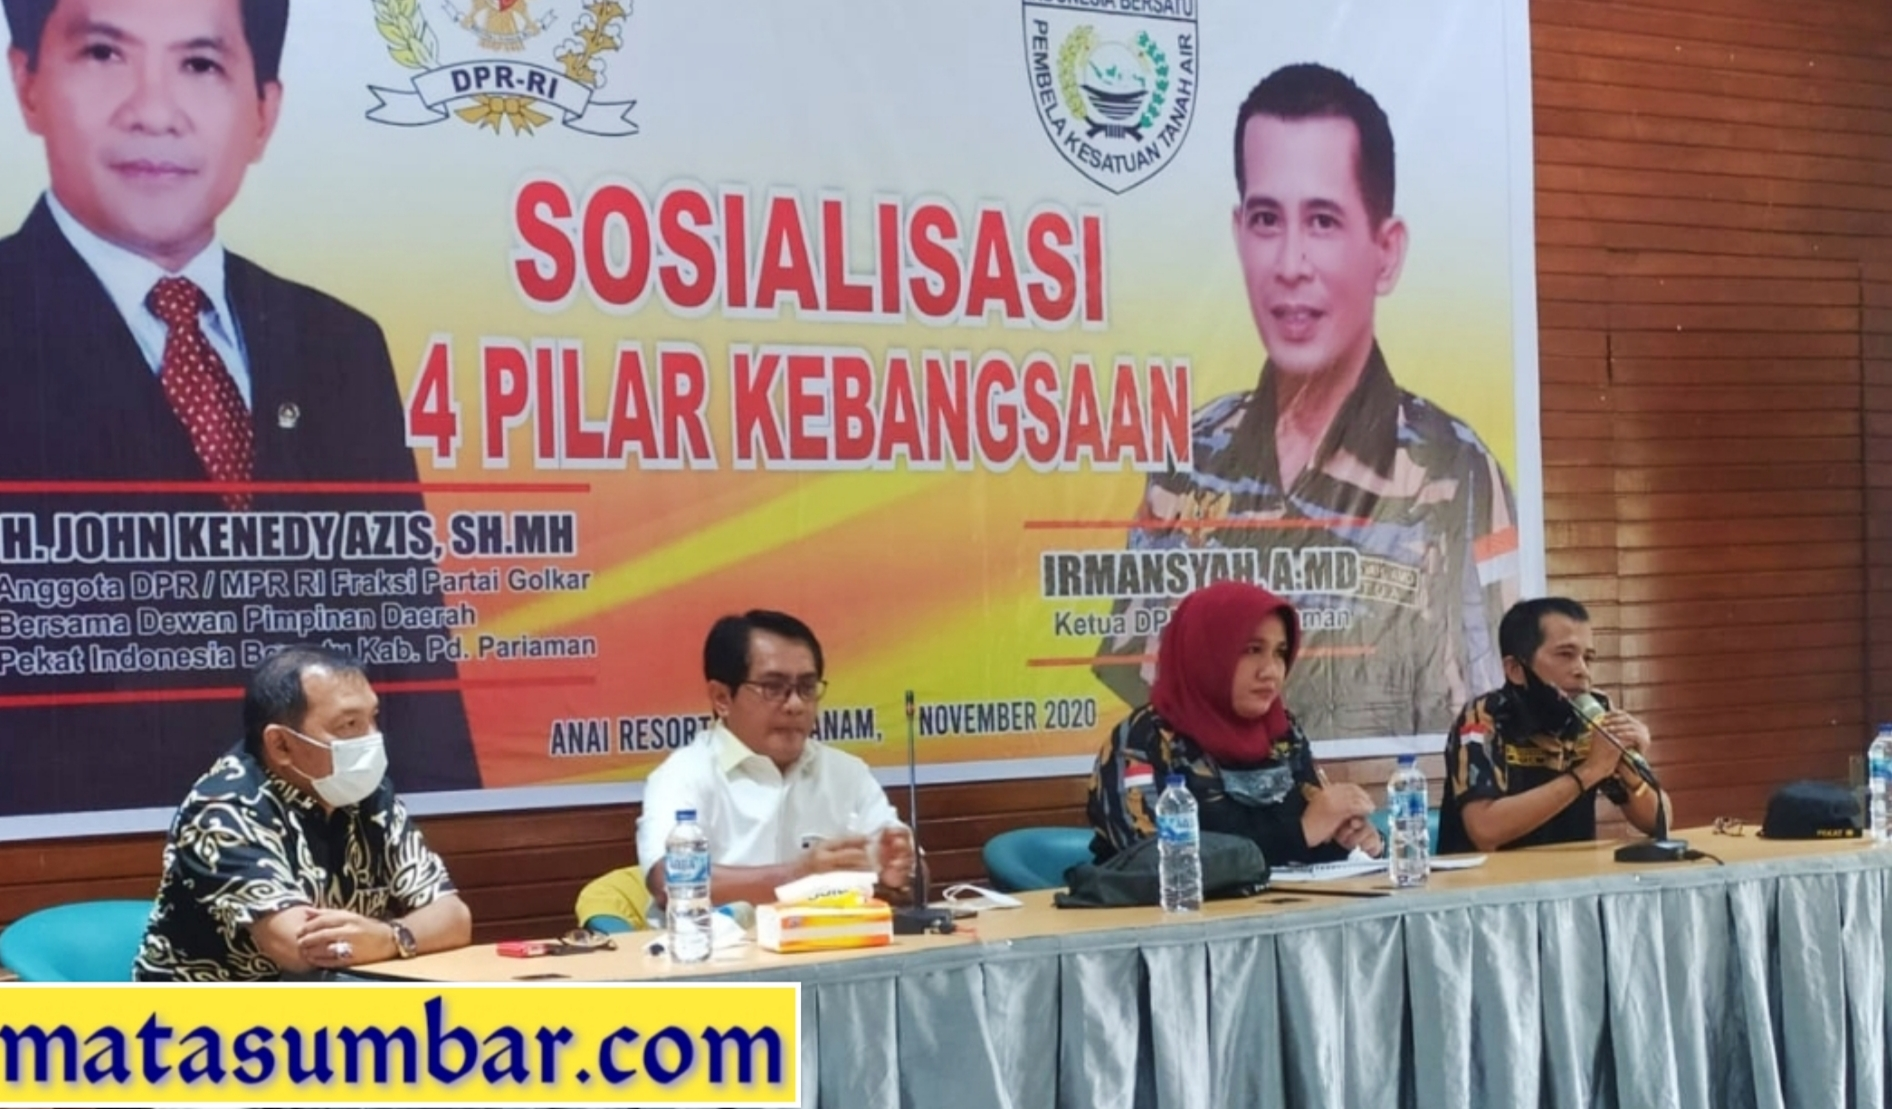 DPD Pekat IB Padang Pariaman Gelar Sosialisasi 4 Pilar Kebangsaan